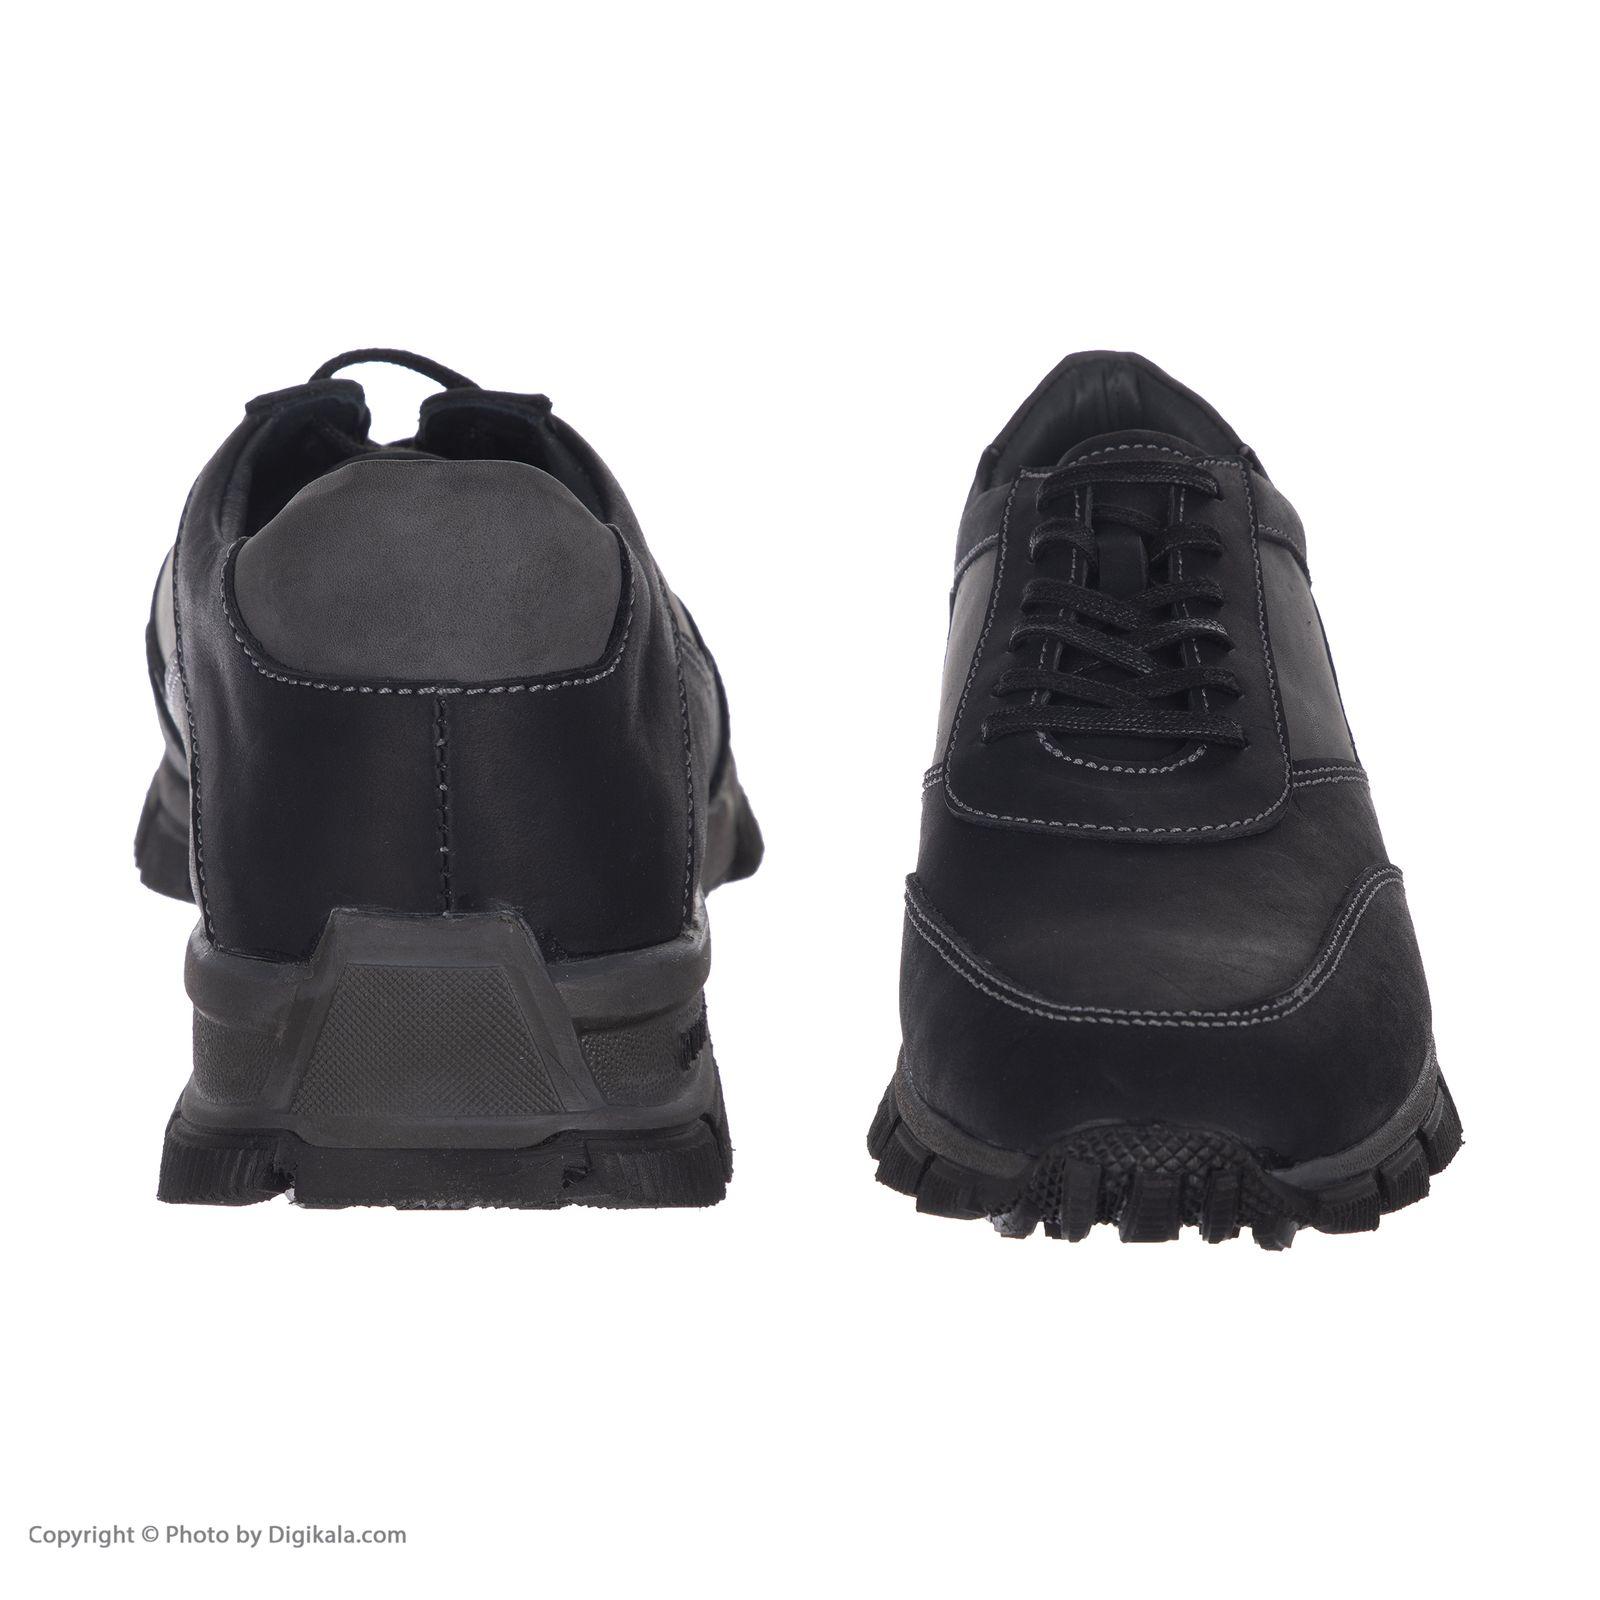 کفش روزمره مردانه دانادل مدل 8604C503101 -  - 3